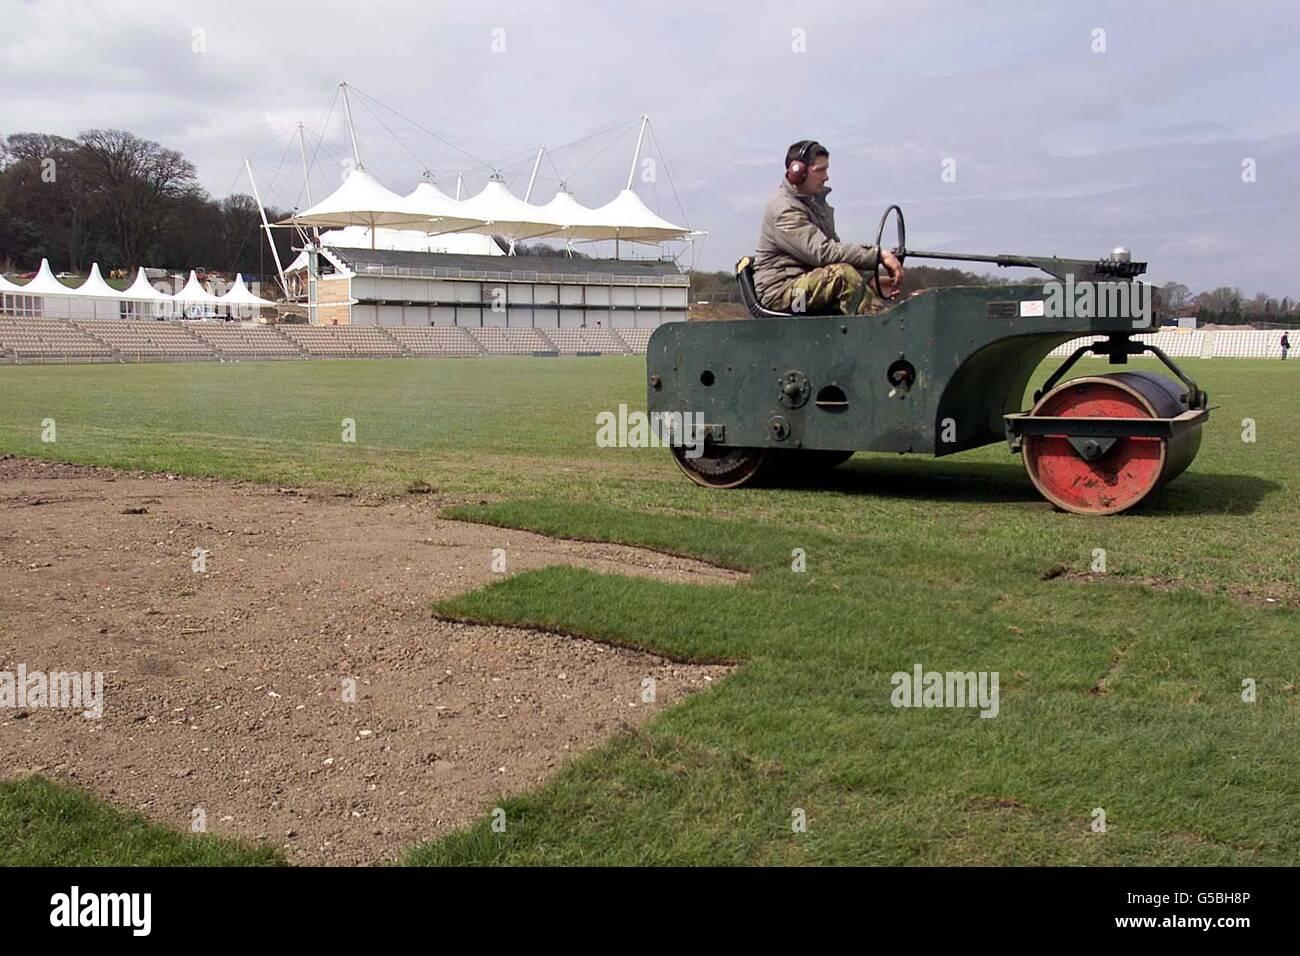 The Rose Bowl Cricket Ground Stock Photo 106590534 Alamy